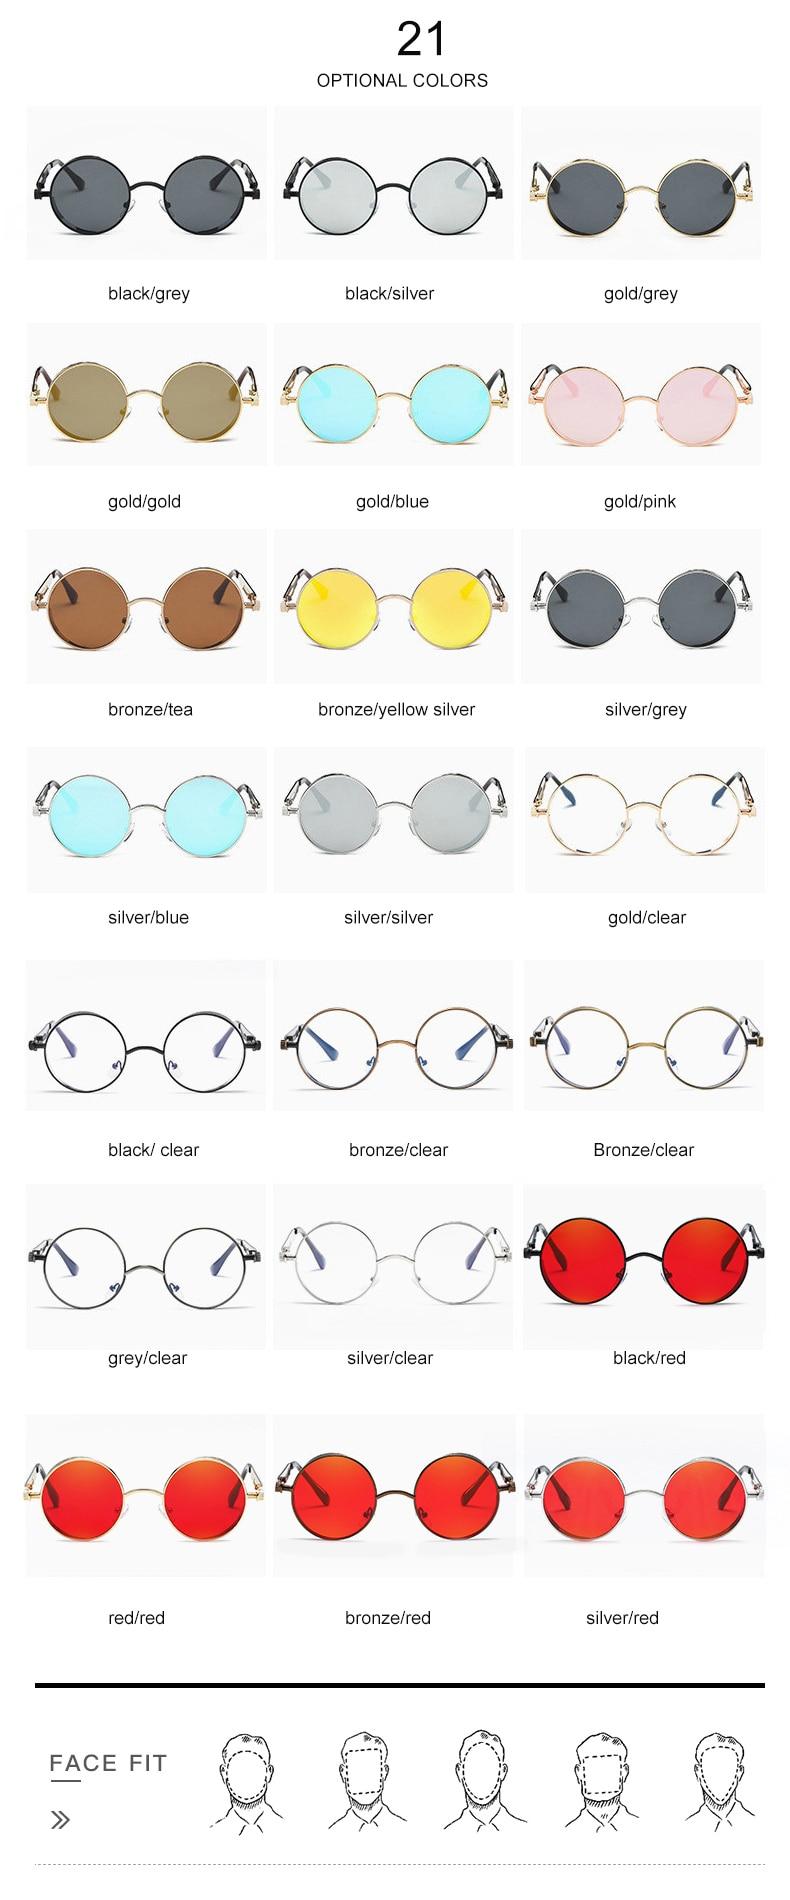 STEAMPUNK - Dapper Round Metal Sunglasses for Men | Dukesman.com